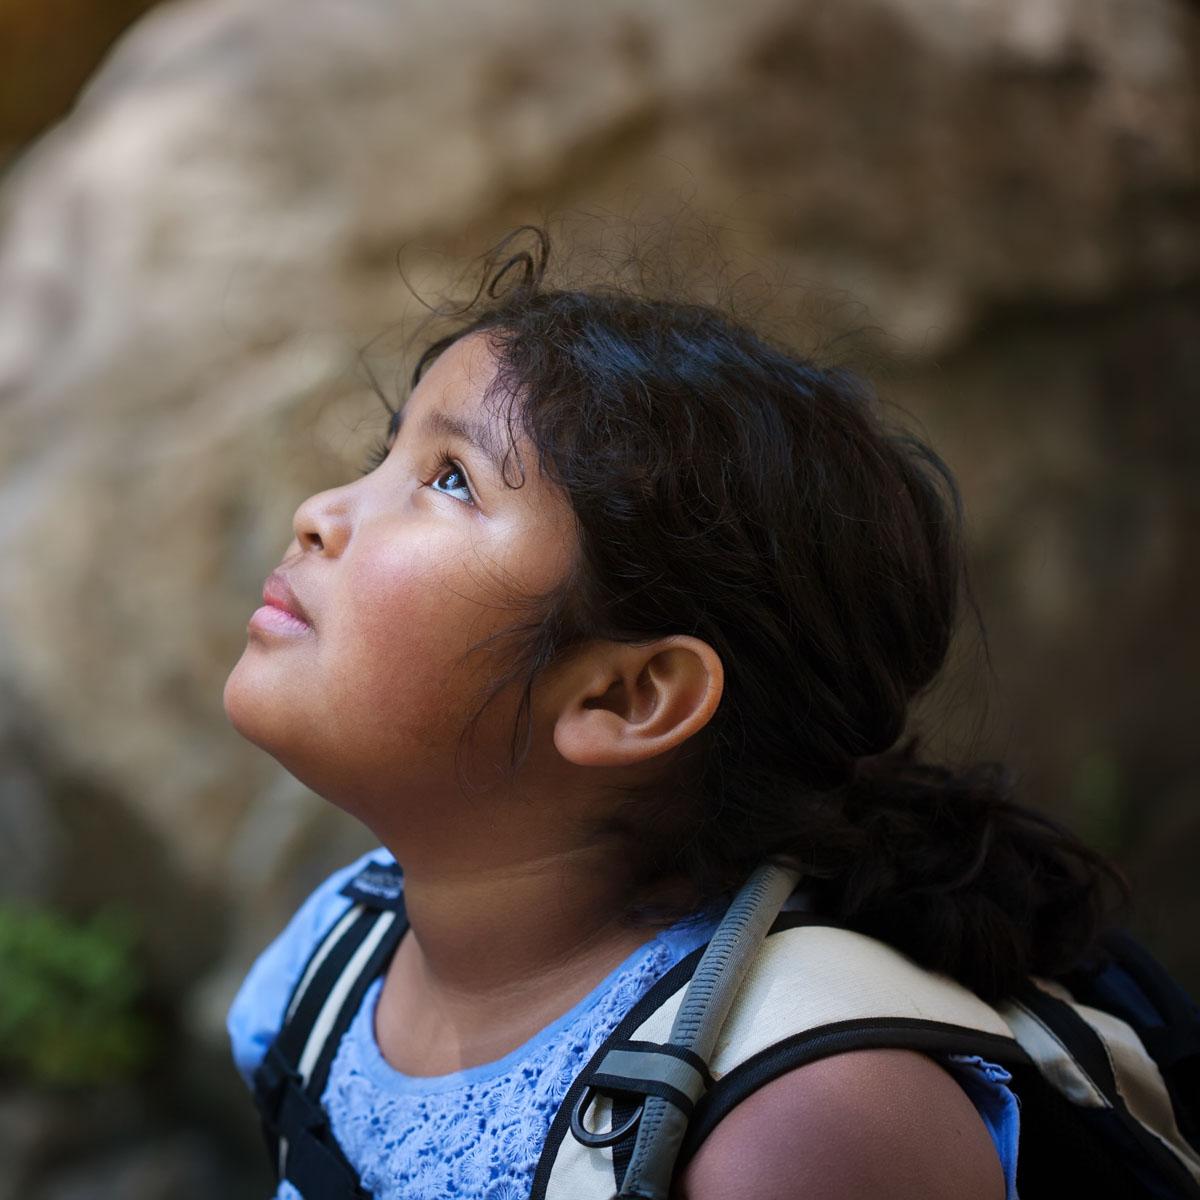 Girl looking up at sky